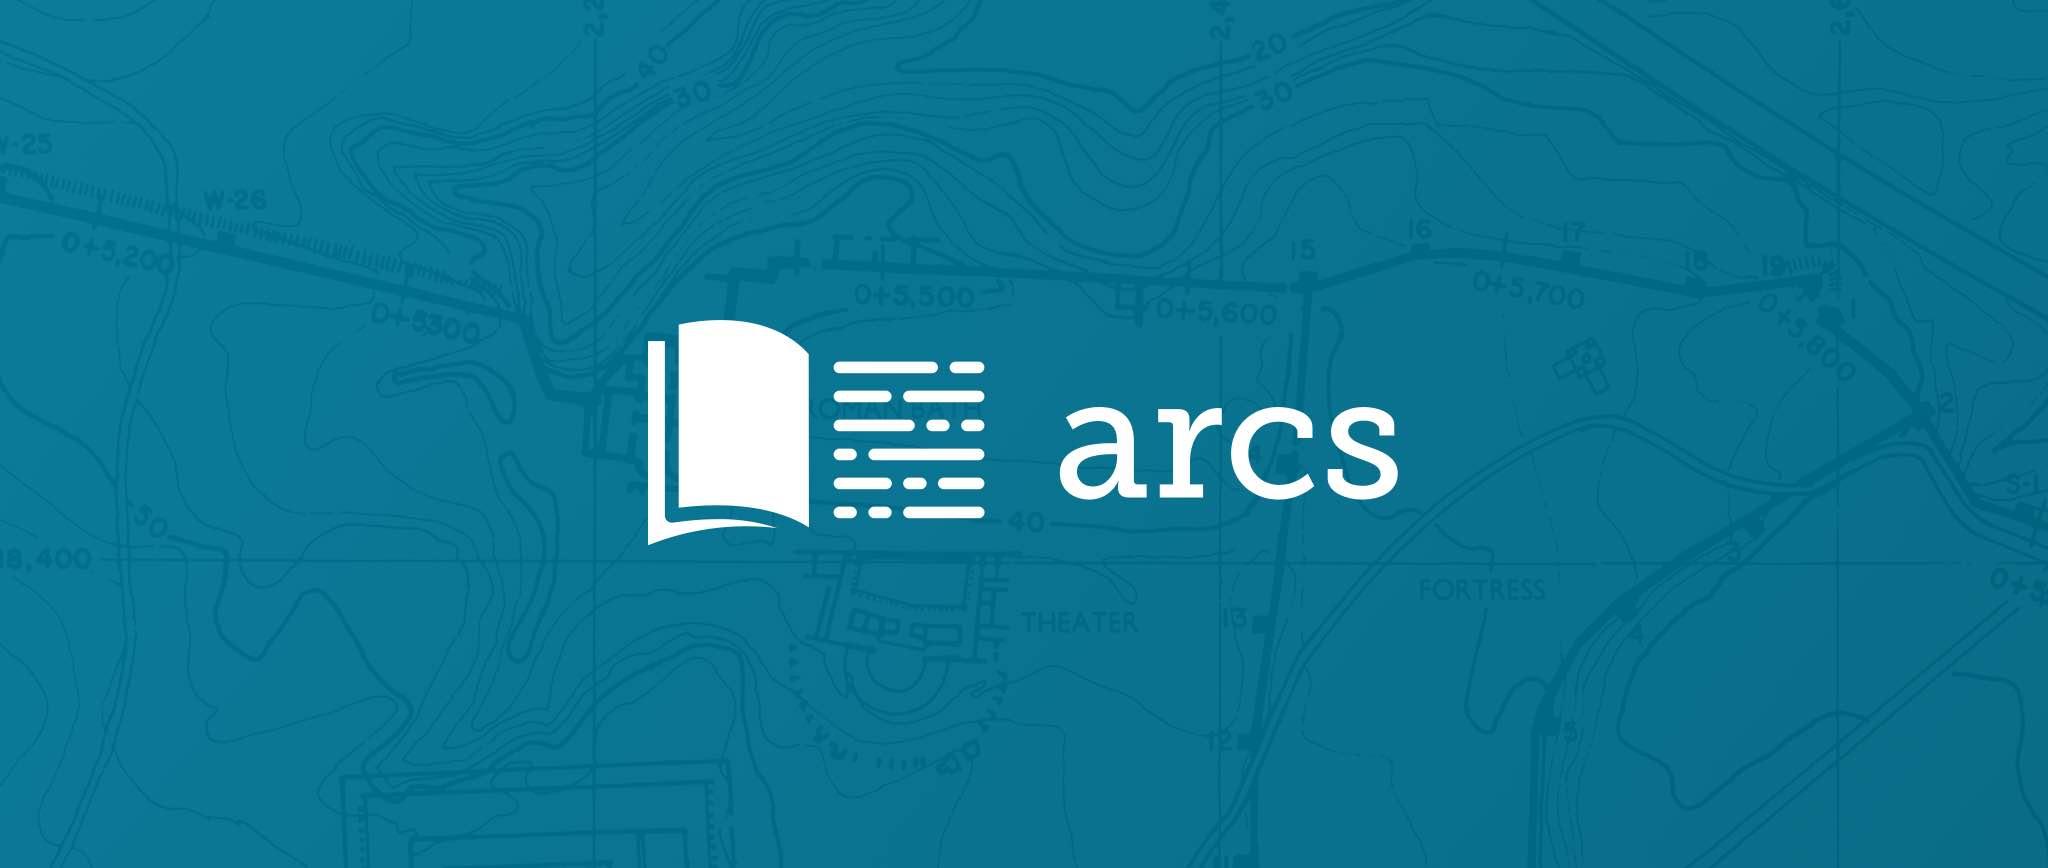 Arcs Imagery